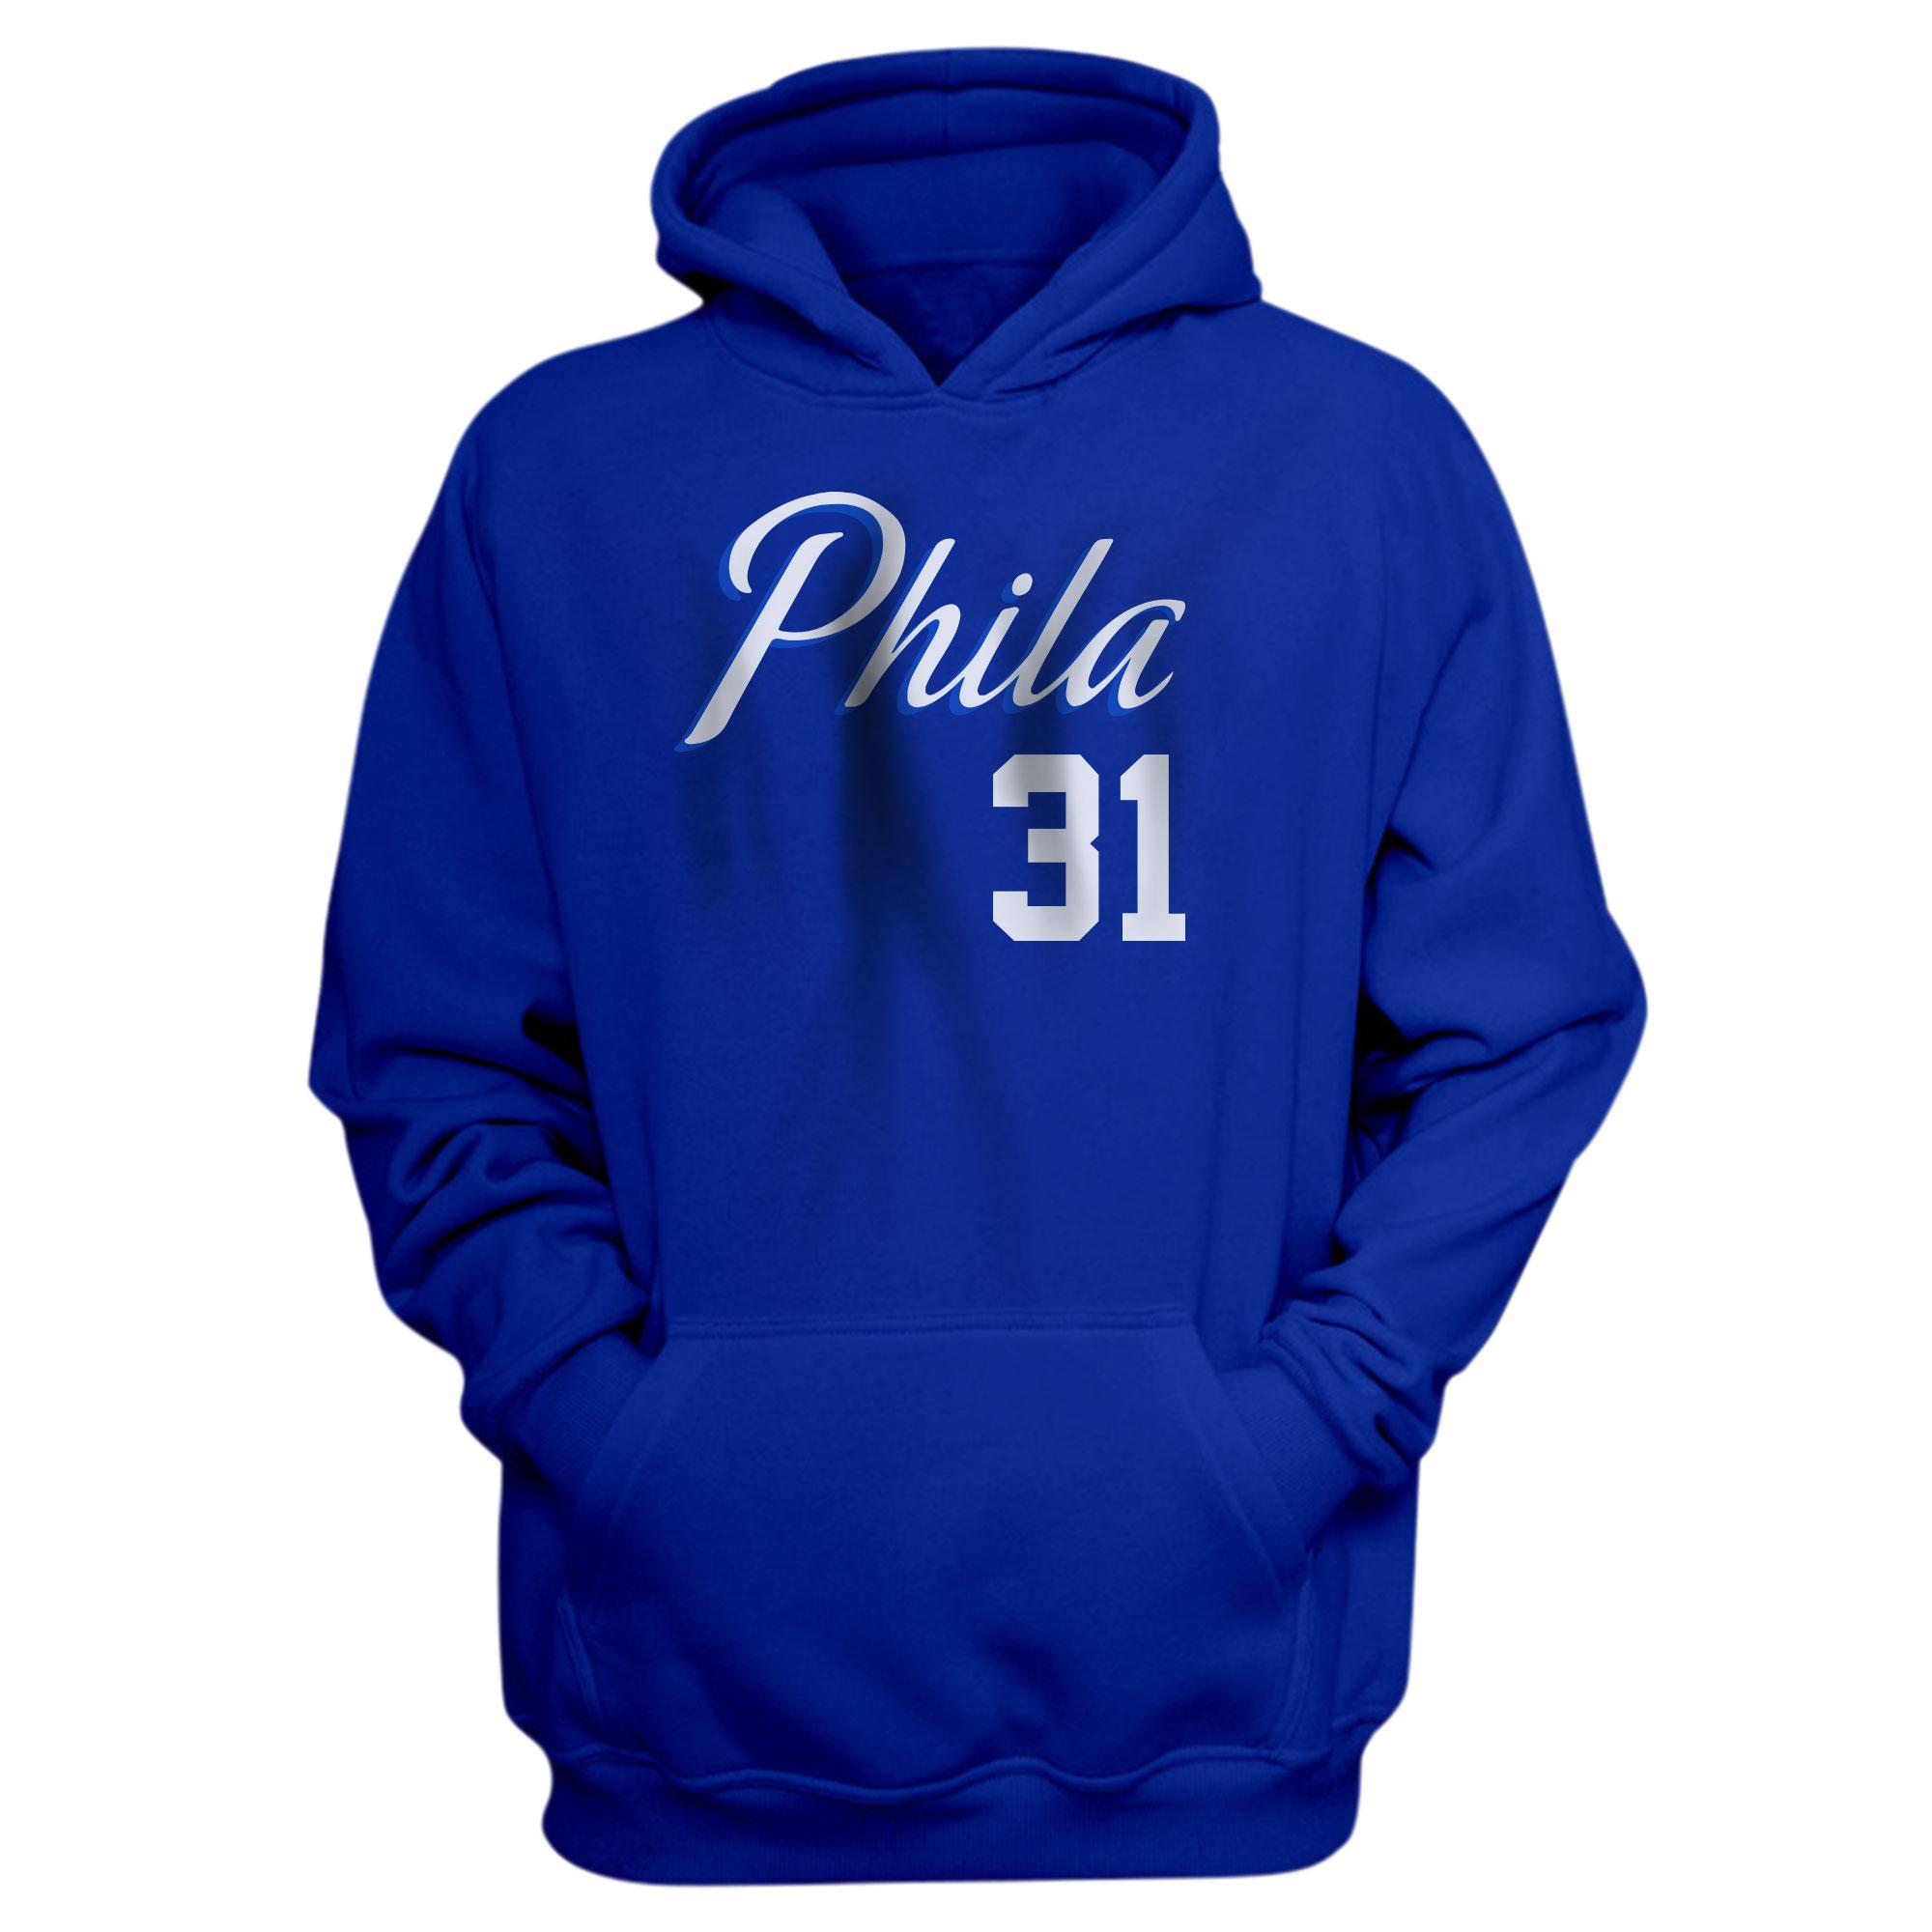 Philadelphia 76ers Seth Curry  Hoodie (HD-BLU-NP-504-31)